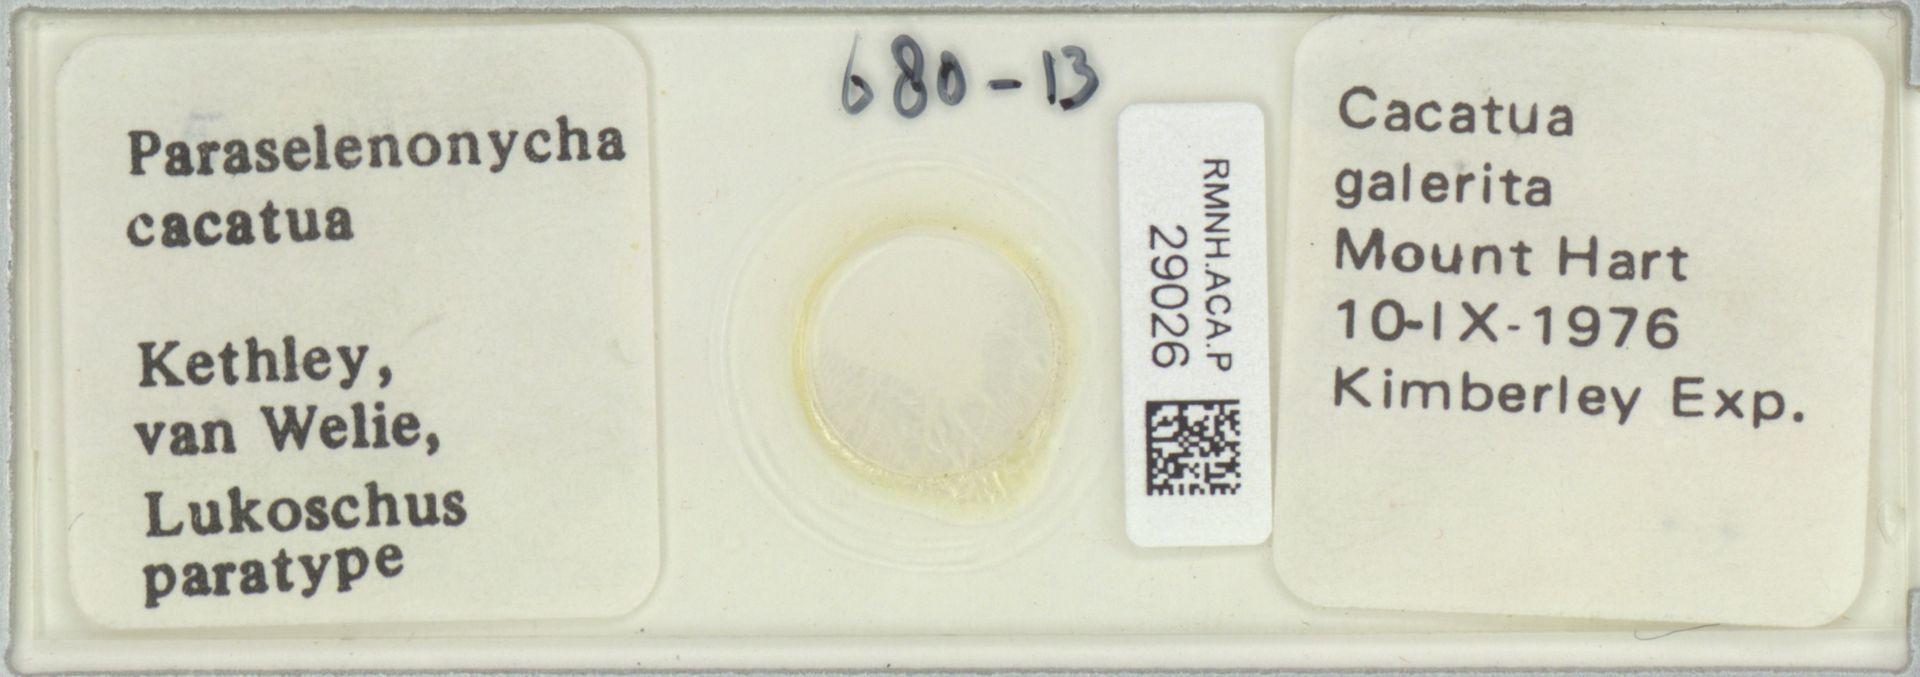 RMNH.ACA.P.29026 | Paraselenonycha cacatua Kethley, van Welie, Lukoschus